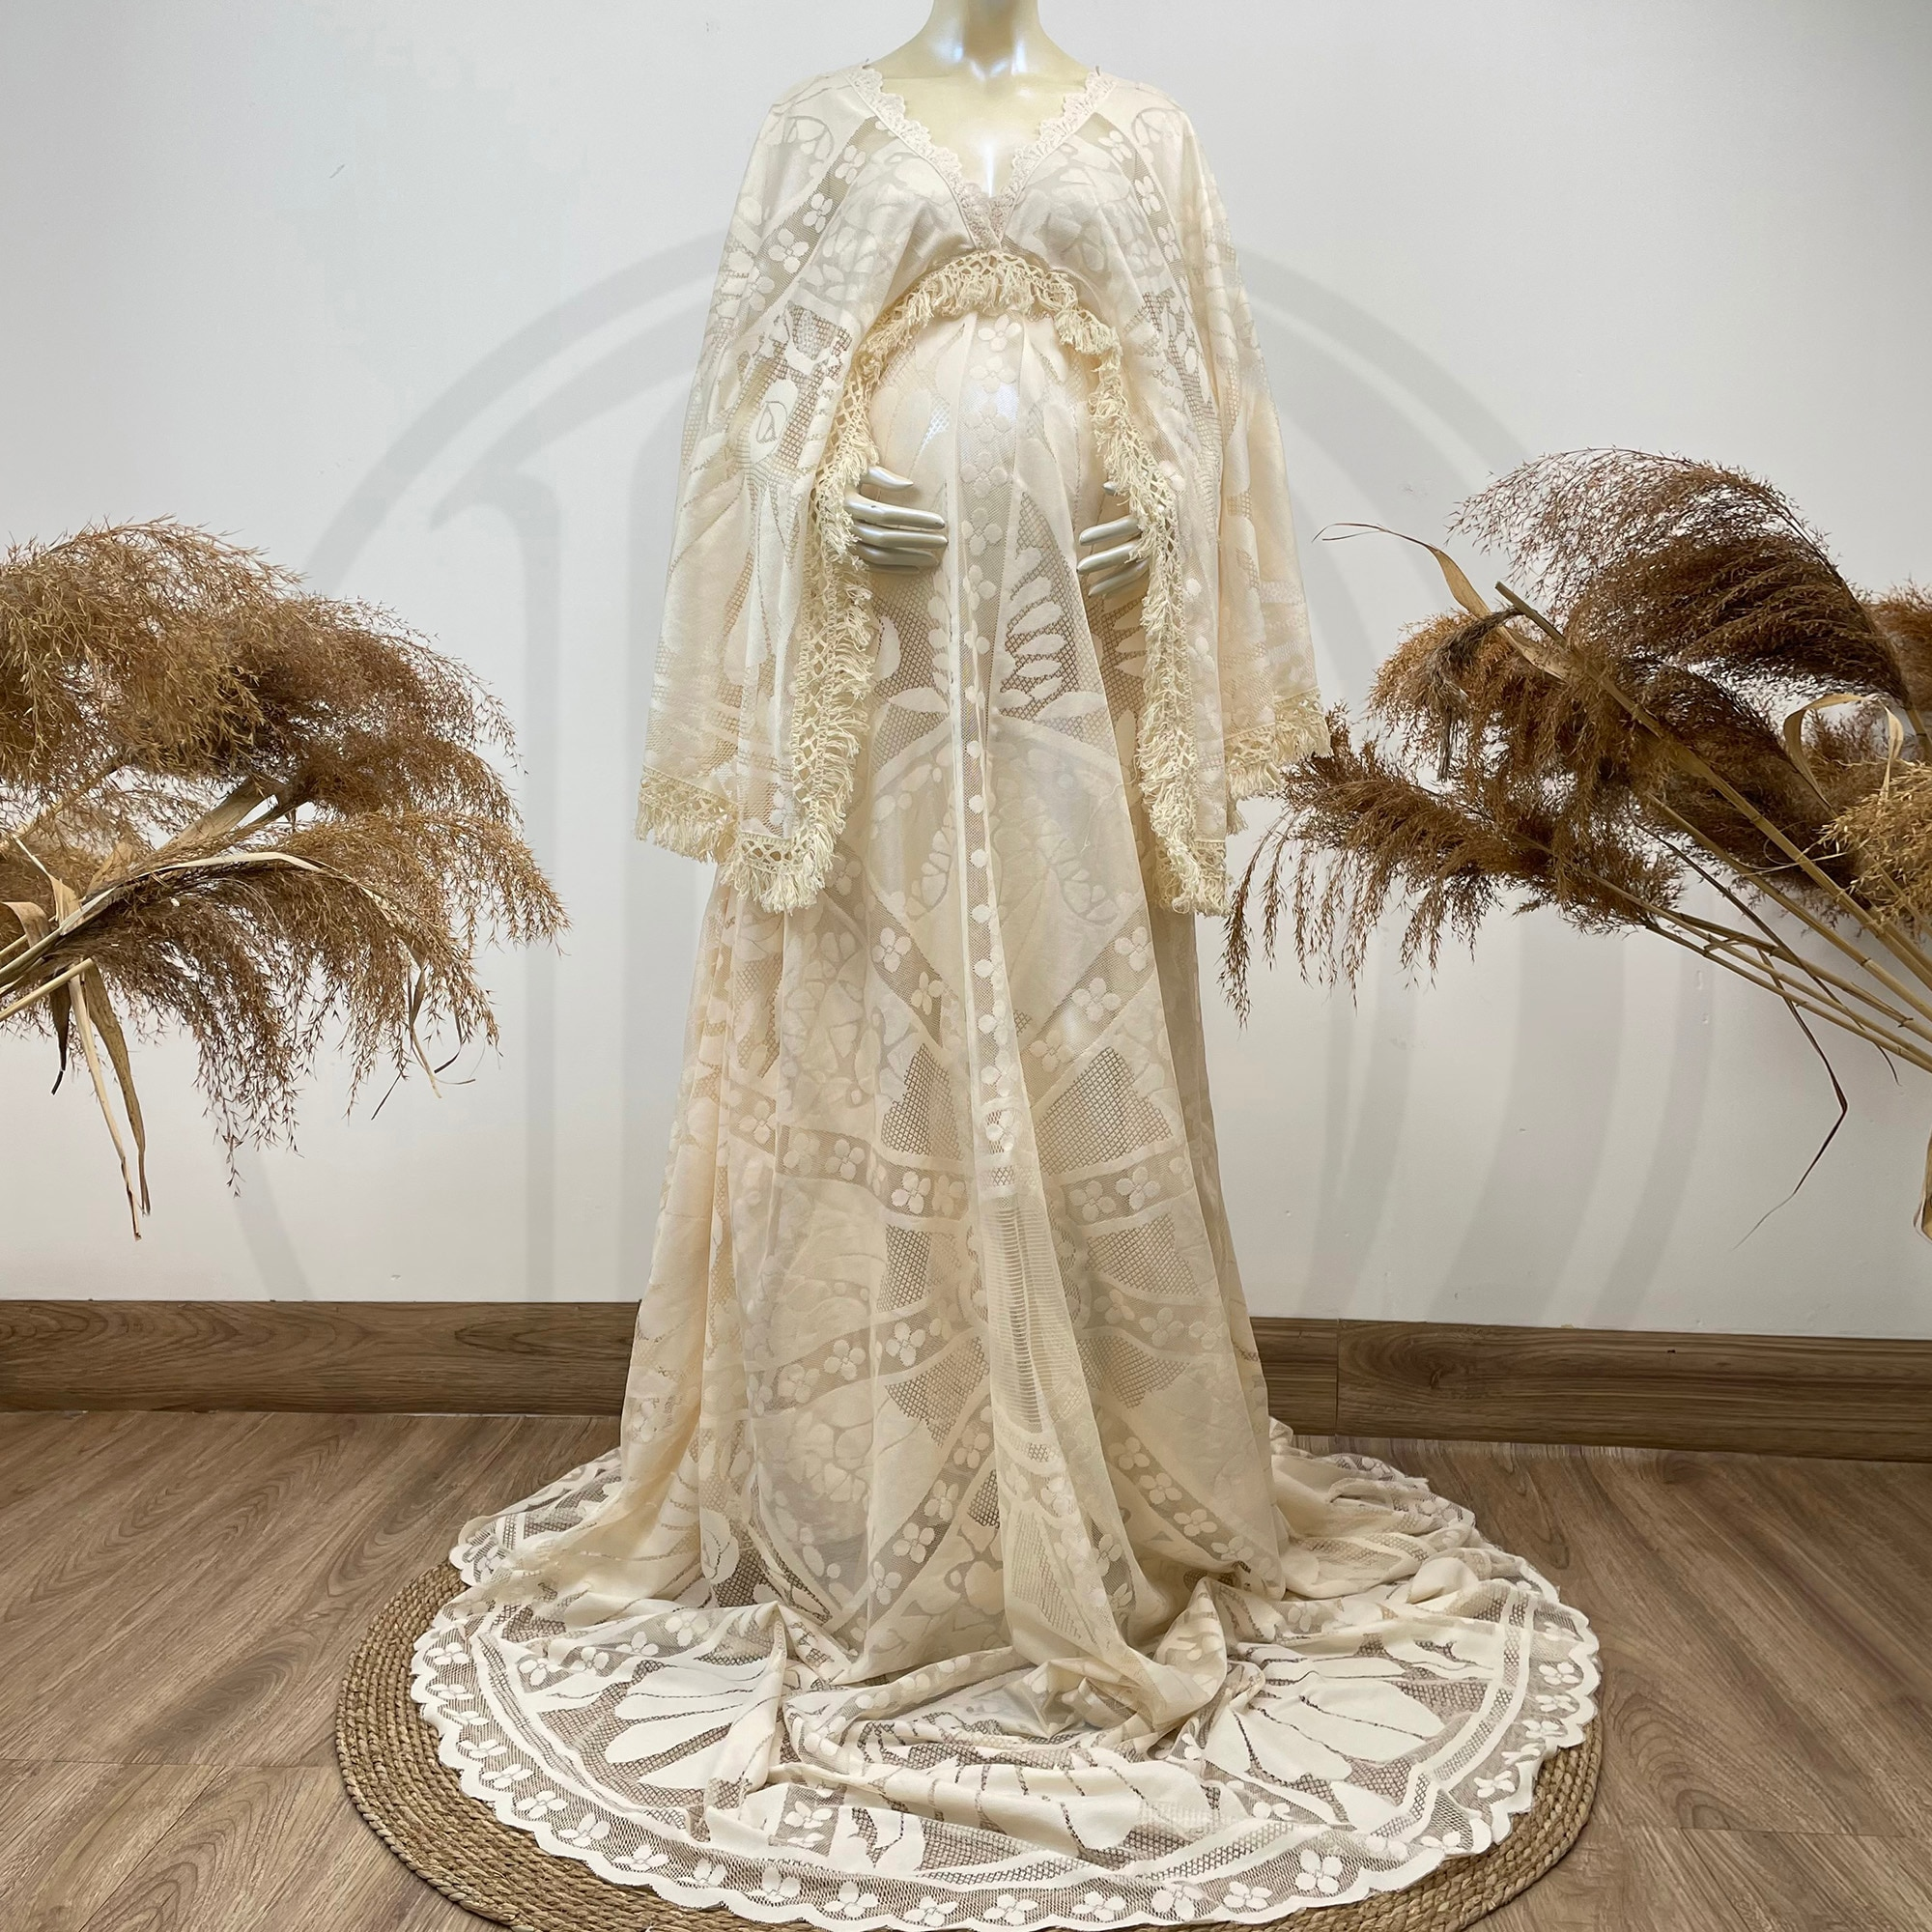 Don&Judy Kaftan Vintage Boho Lace Maternity Dress Photography Photo Clothes Party Bohemian Gown Pregnancy Dresses Photo Shoot enlarge